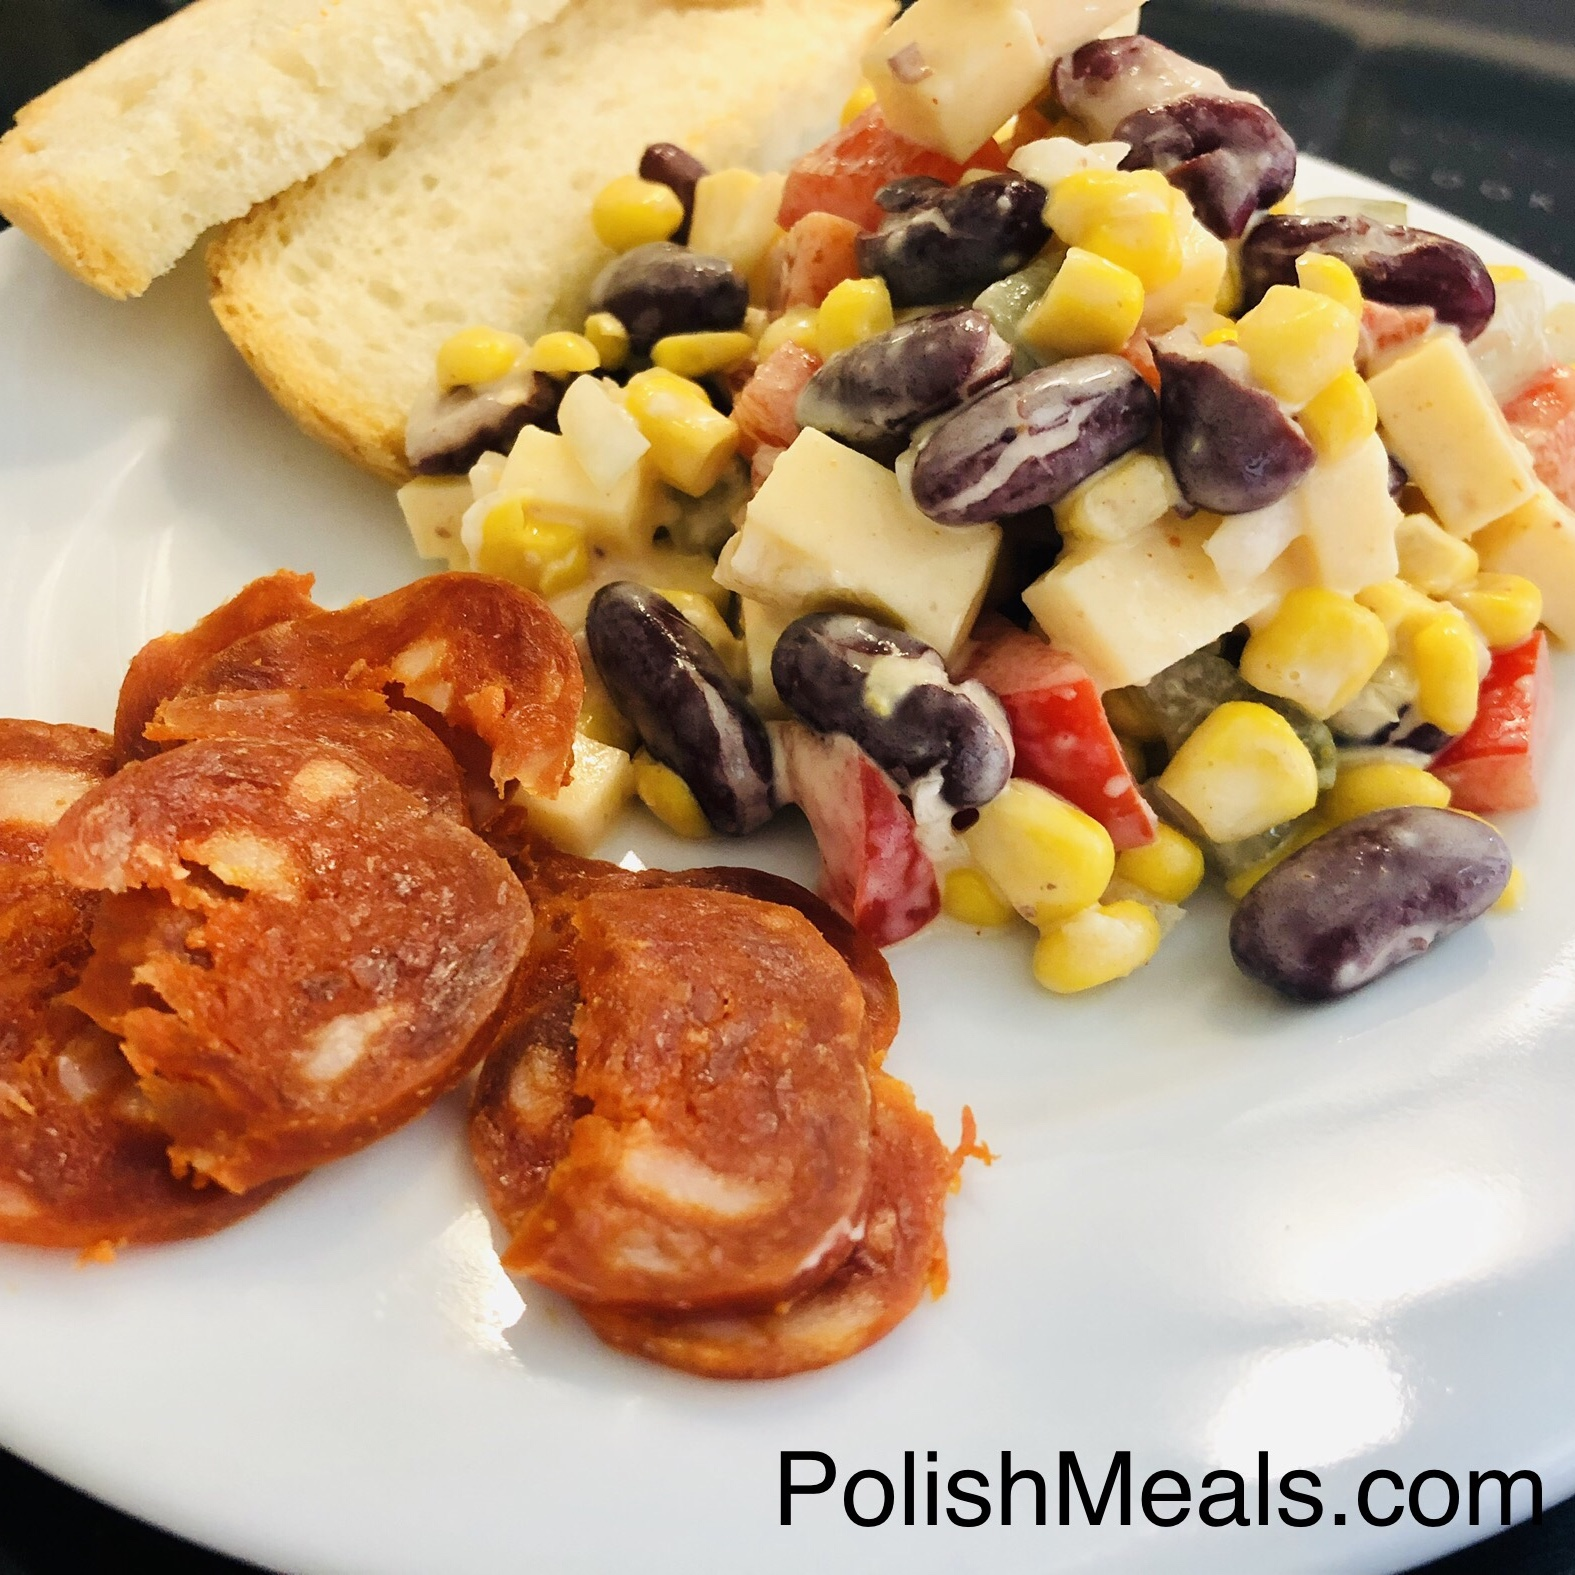 polish-mexican salad